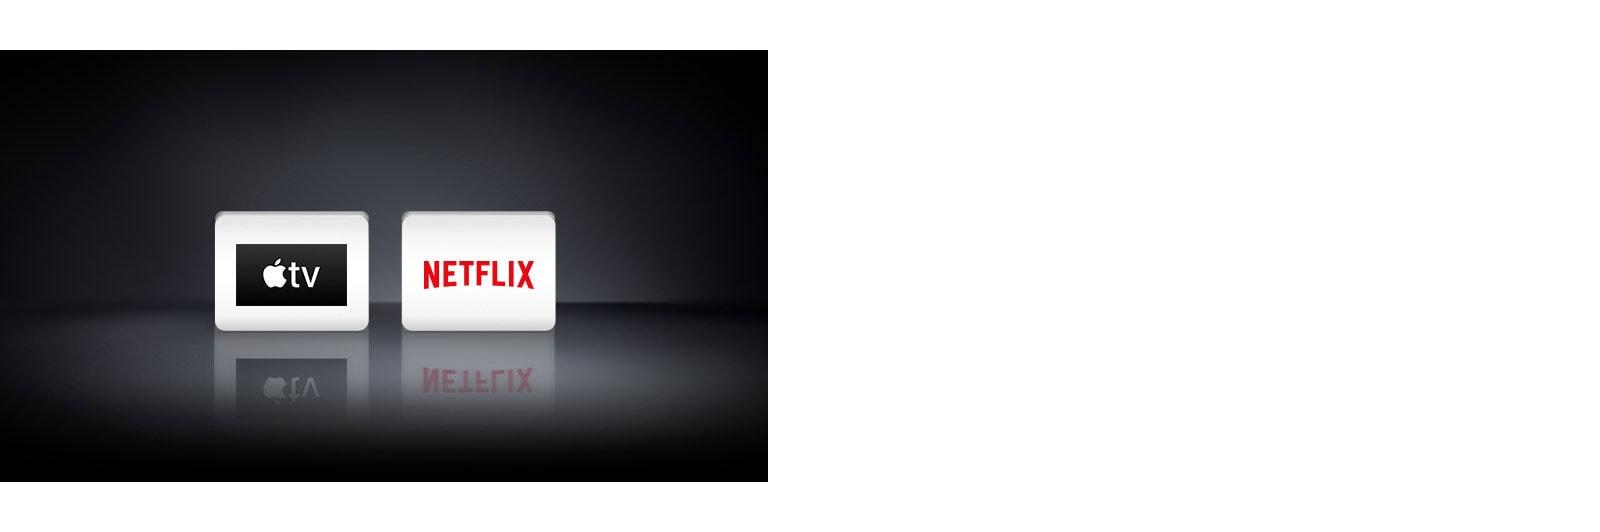 Dva logotipa: aplikacija Apple TV, Netflix